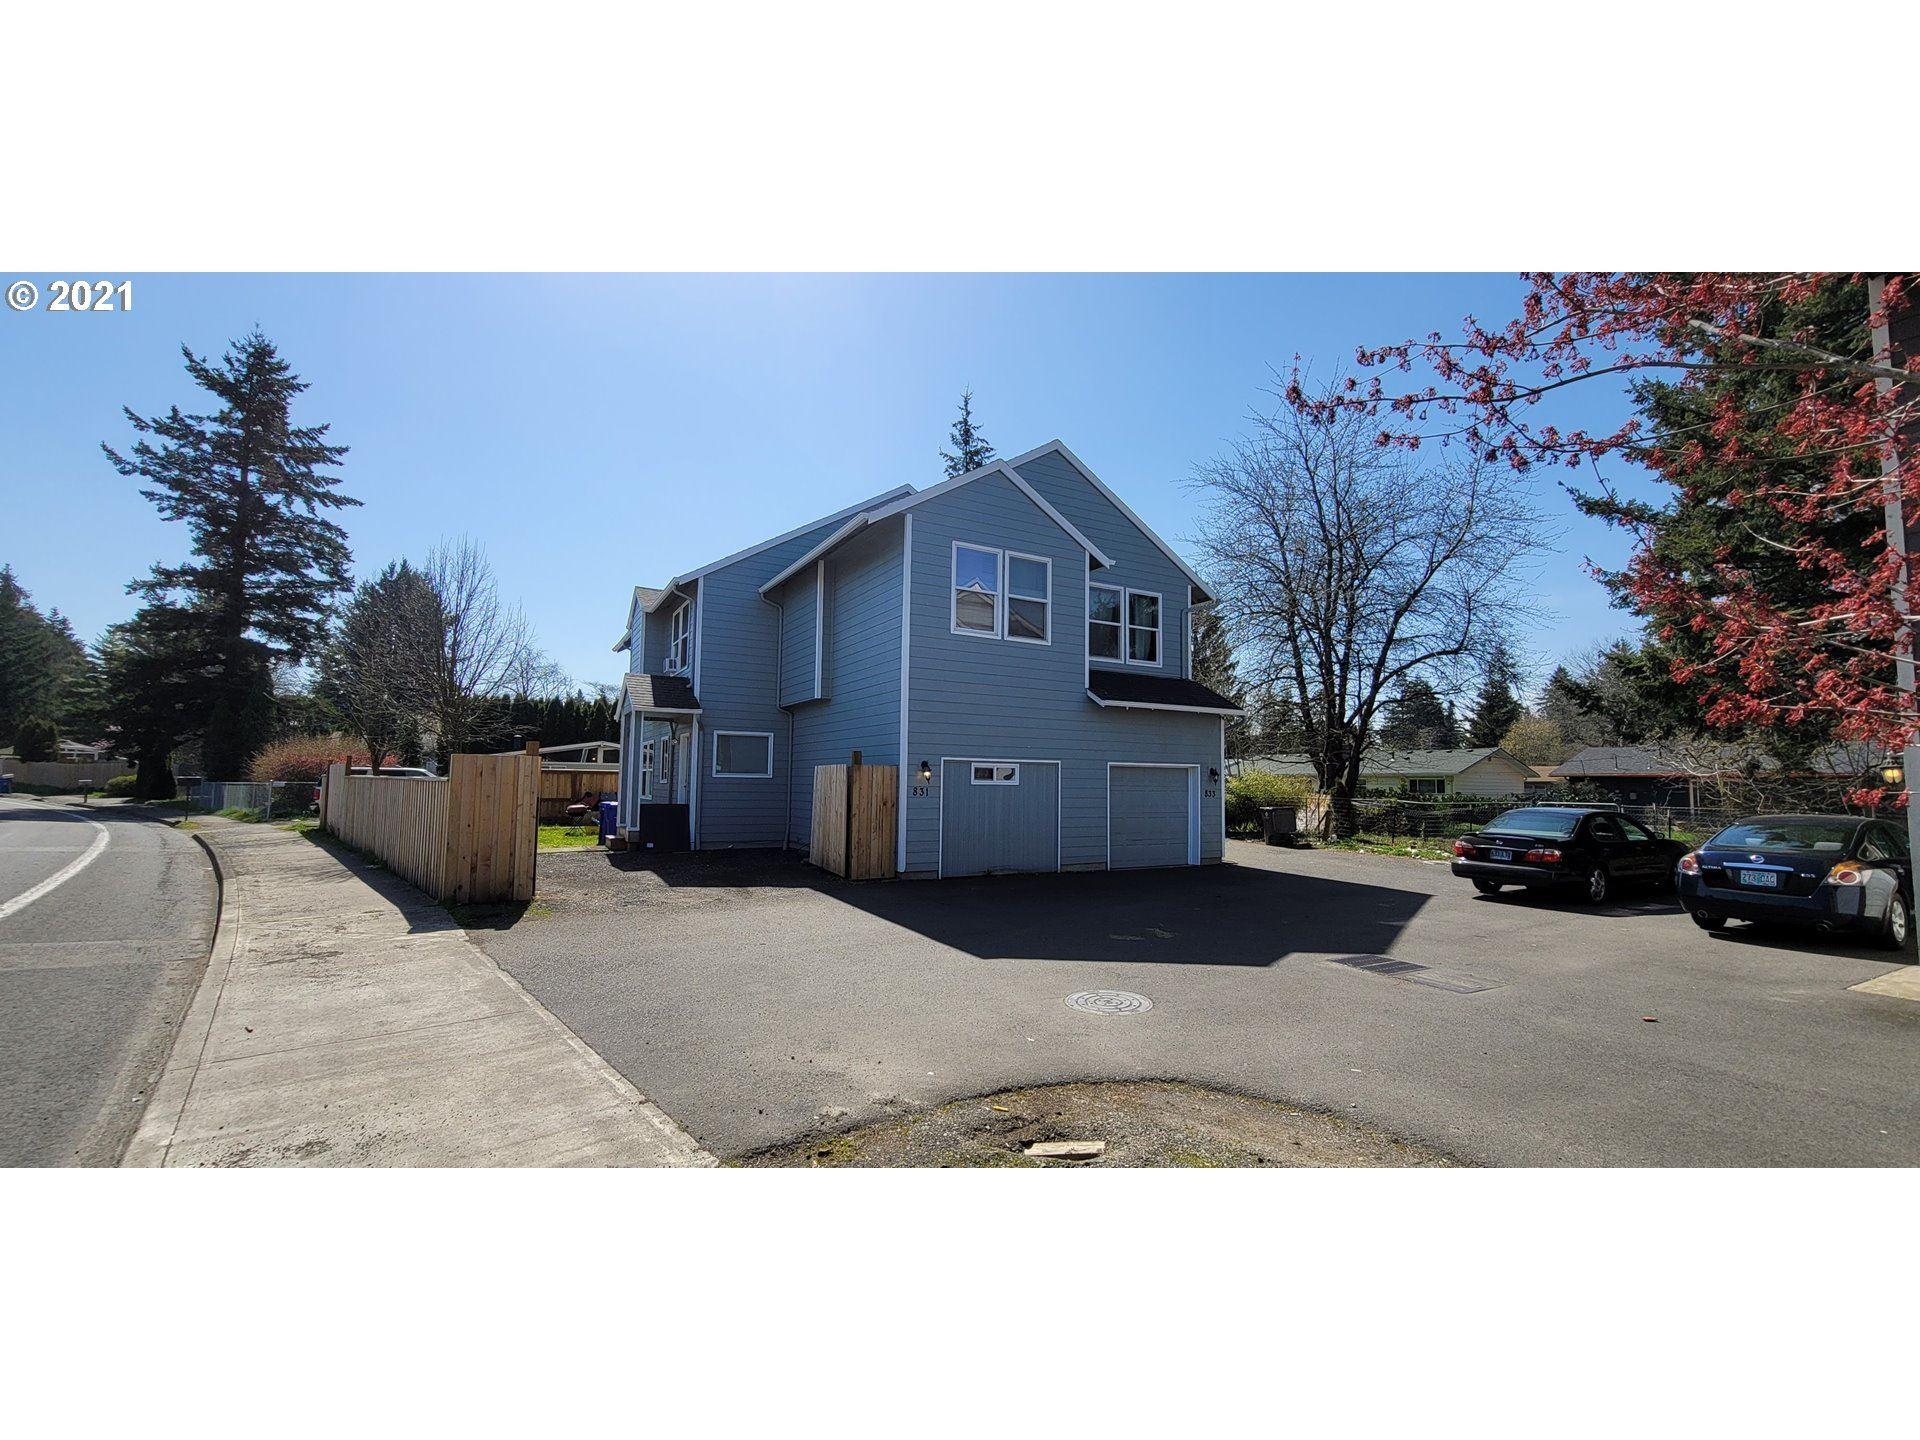 831 SE 181ST AVE, Portland, OR 97035 - MLS#: 21331057